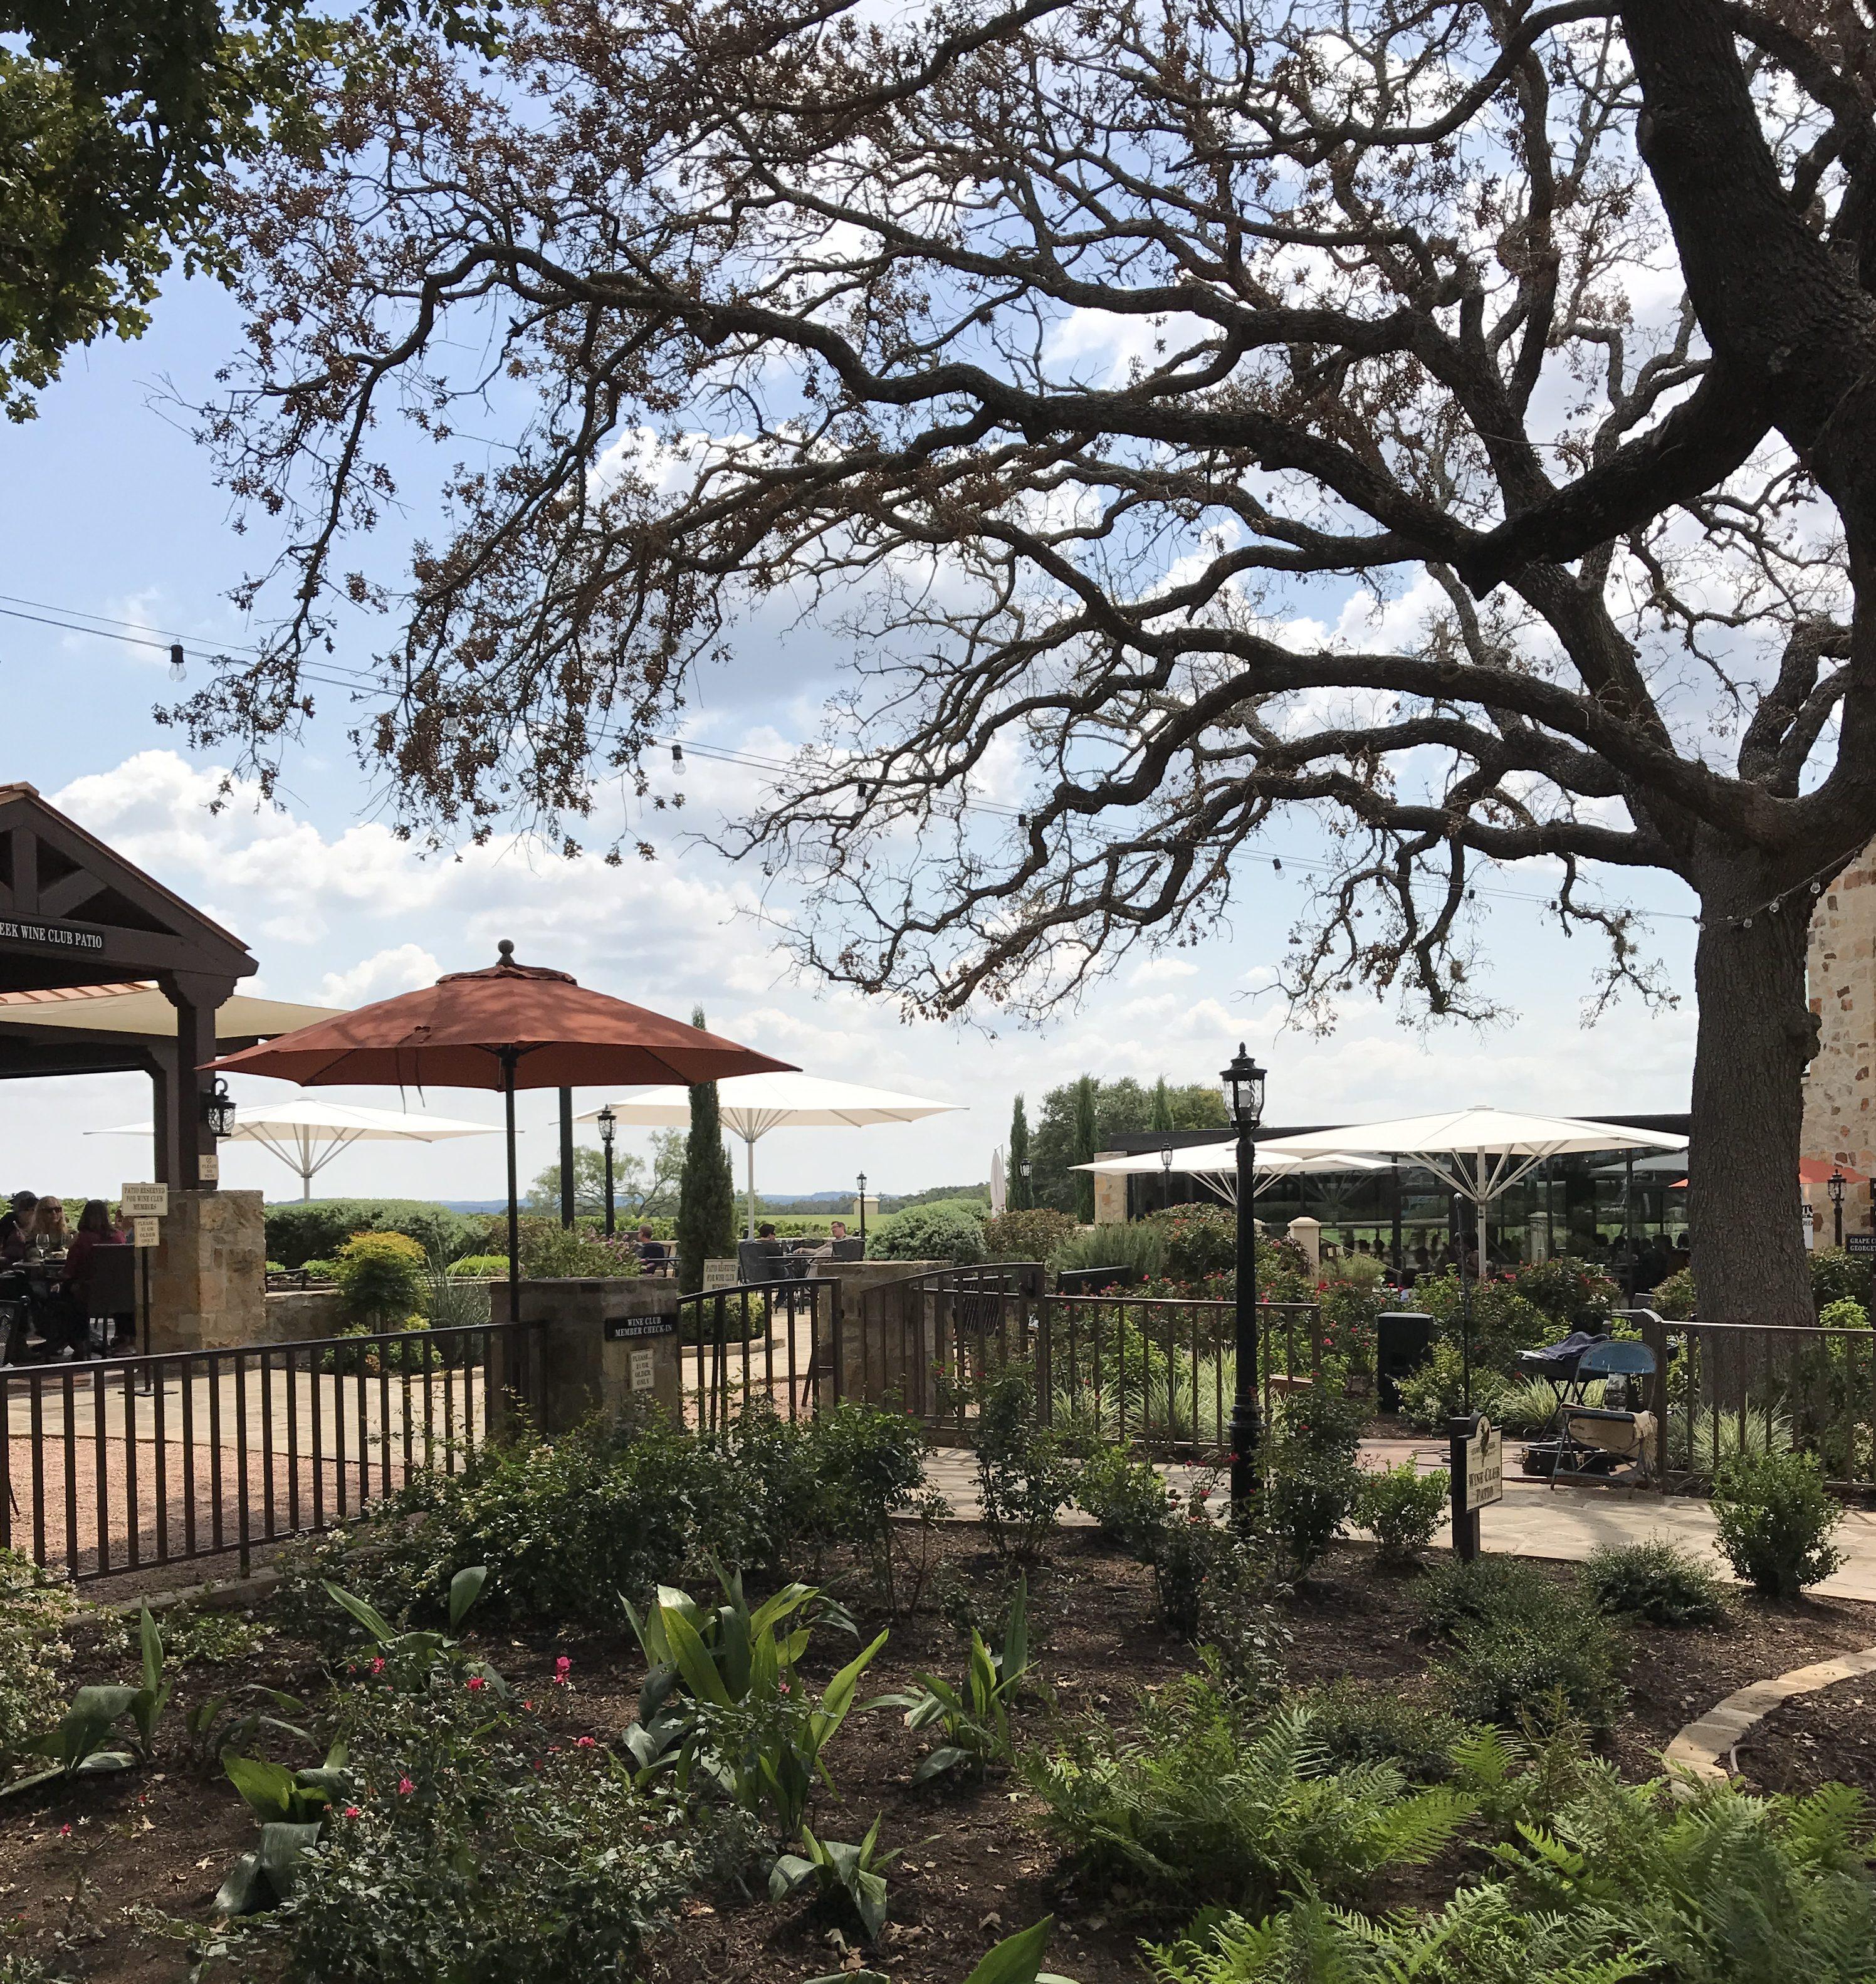 Grape Creek Vineyards - An Anniversary Weekend in Johnson City, Texas